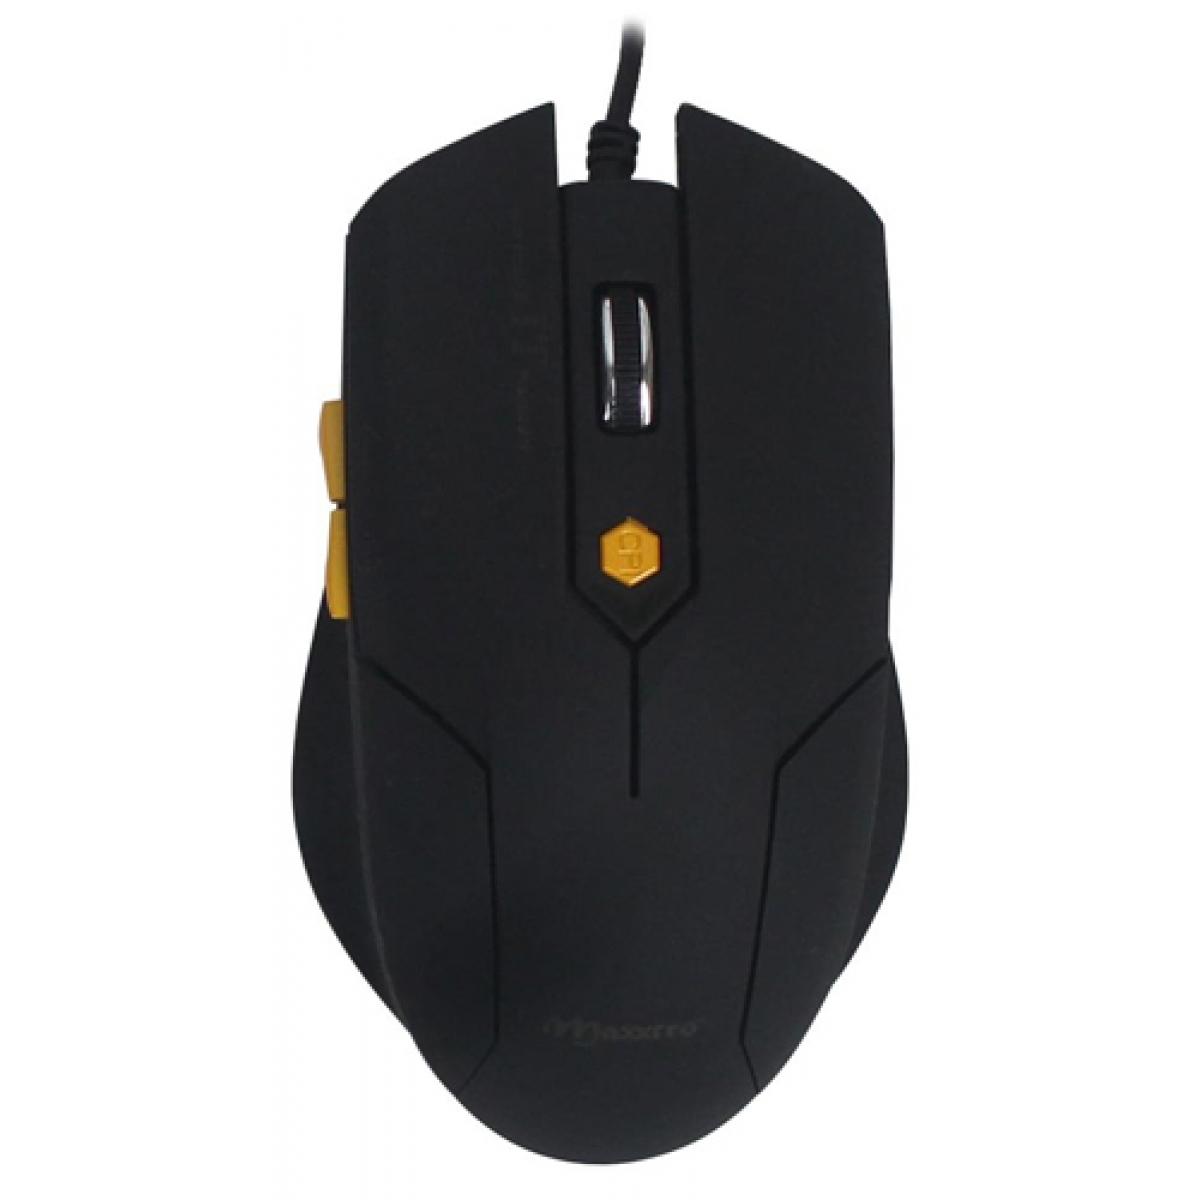 Mouse Óptico Maxxtro JM-1201/BK USB 6 Botões 1600 DPI Black